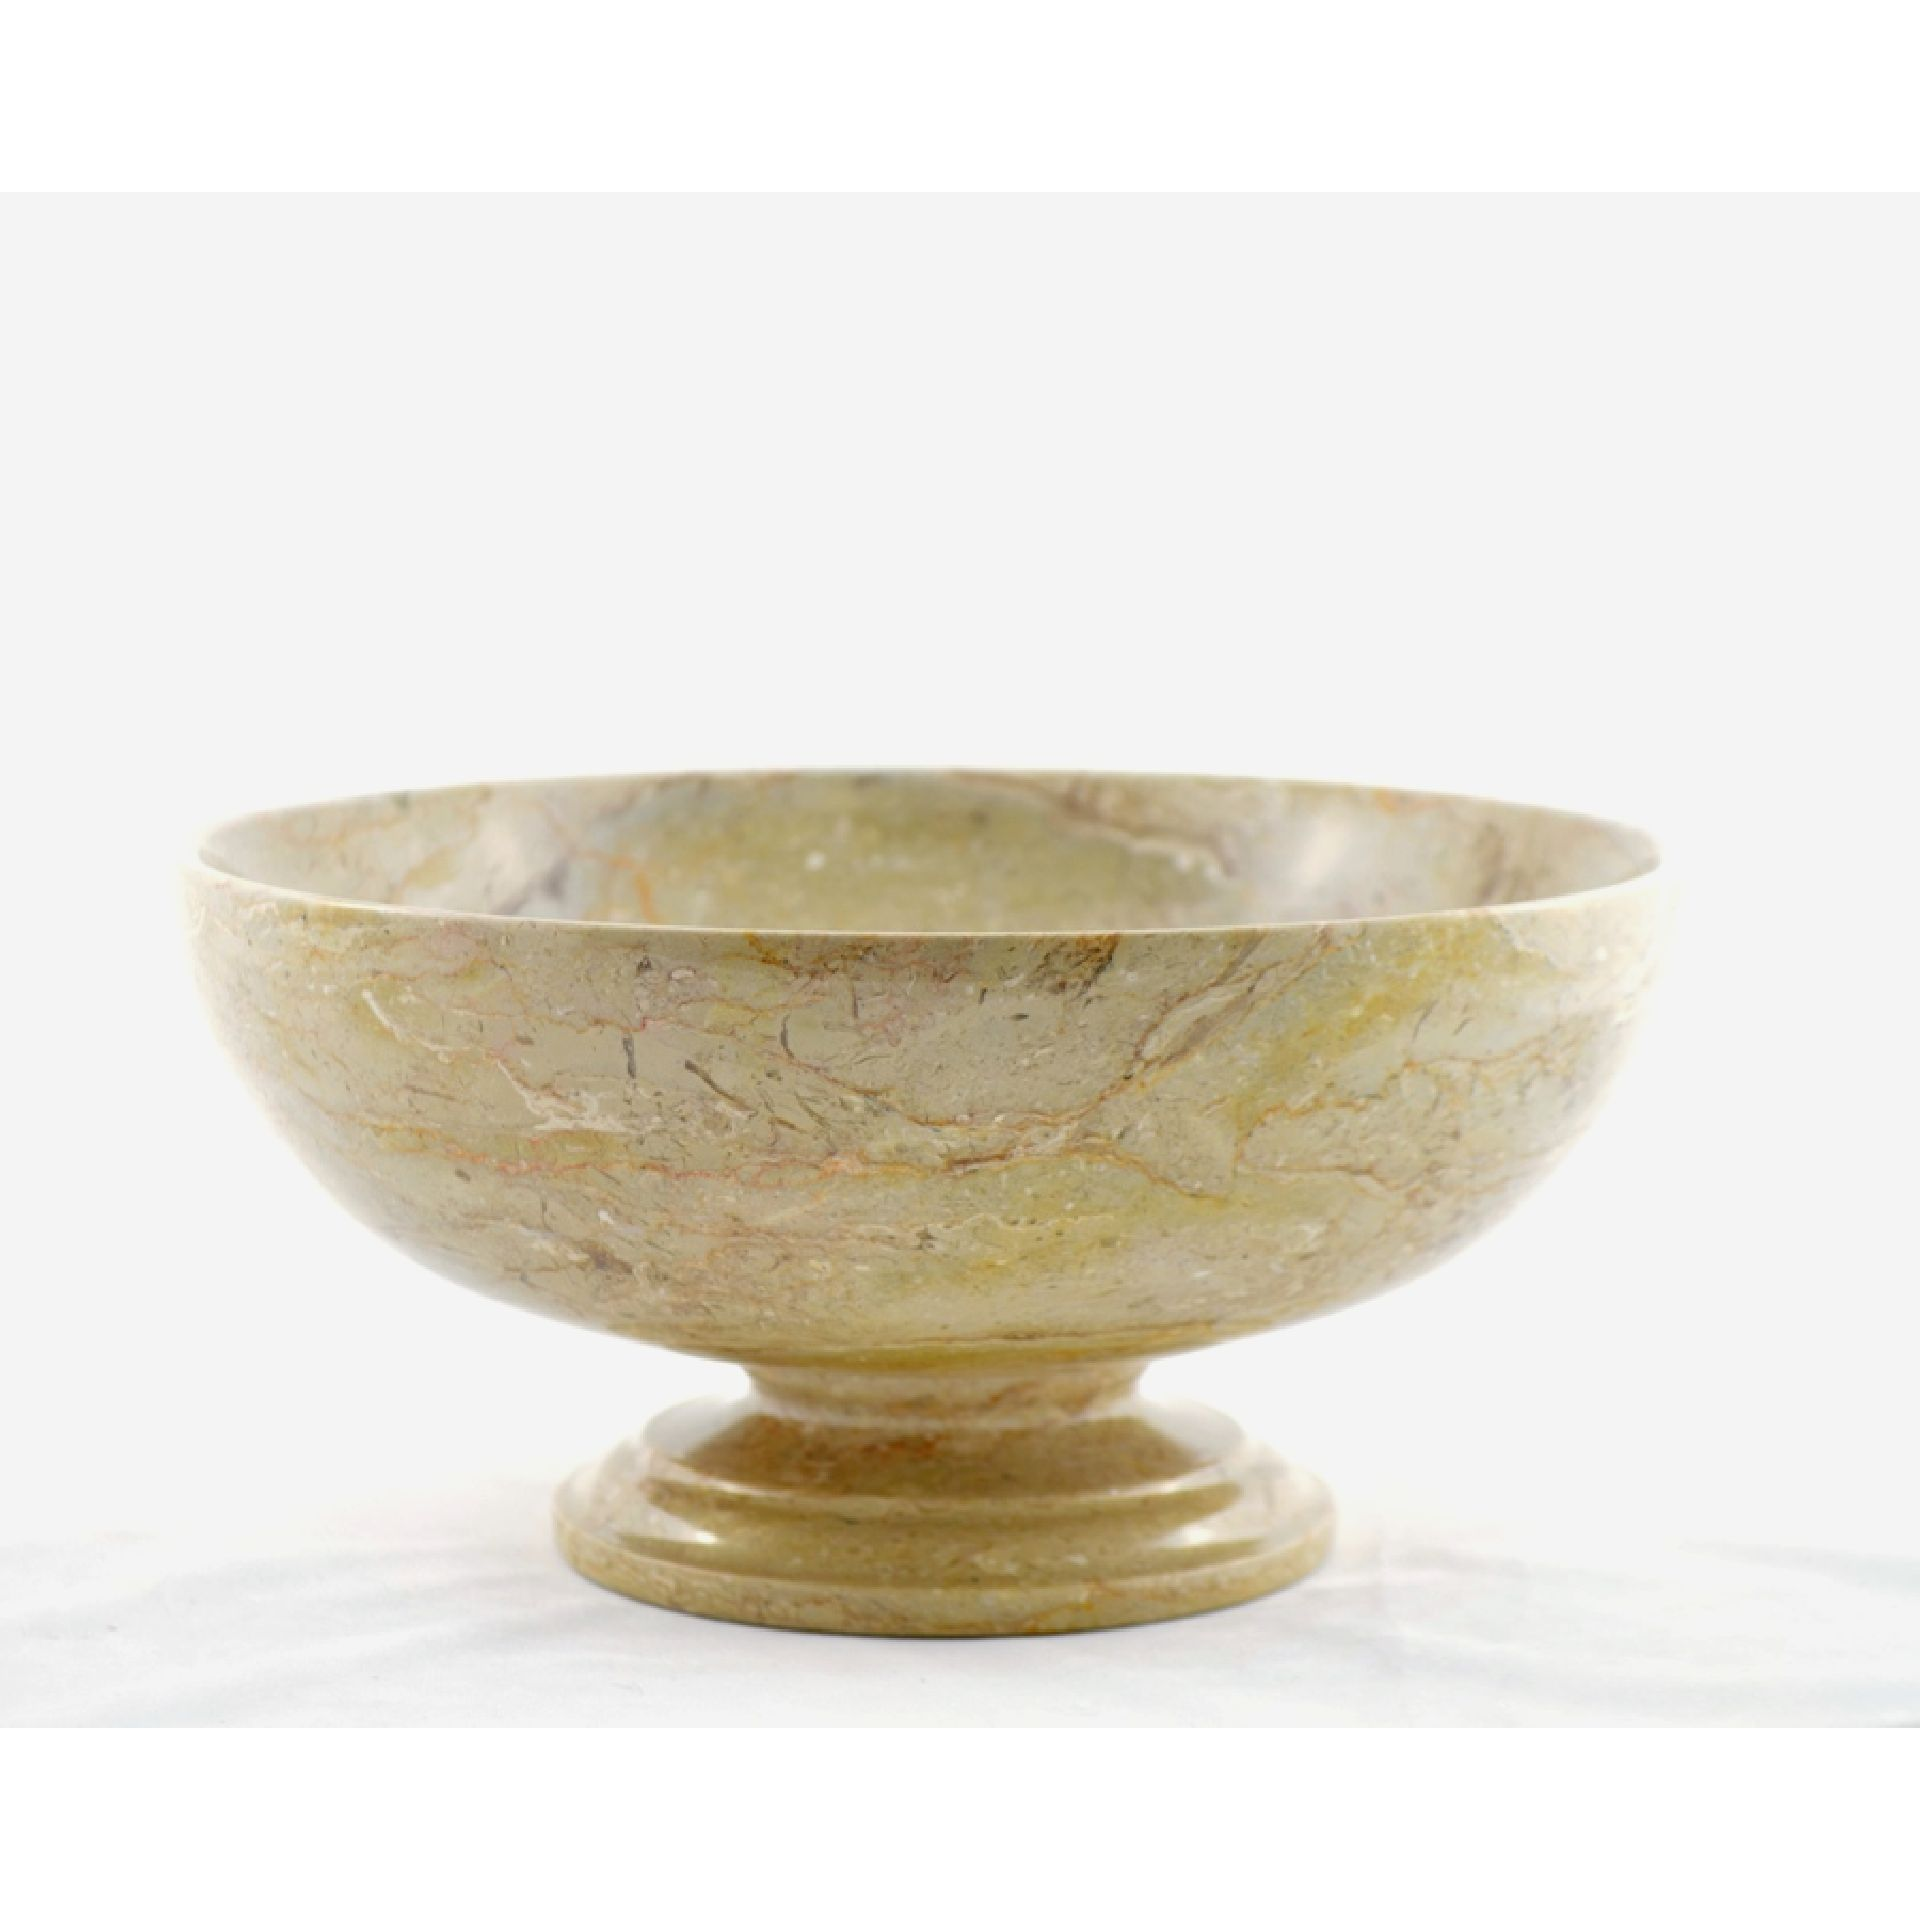 Sahara 9-inch Classic Bowl